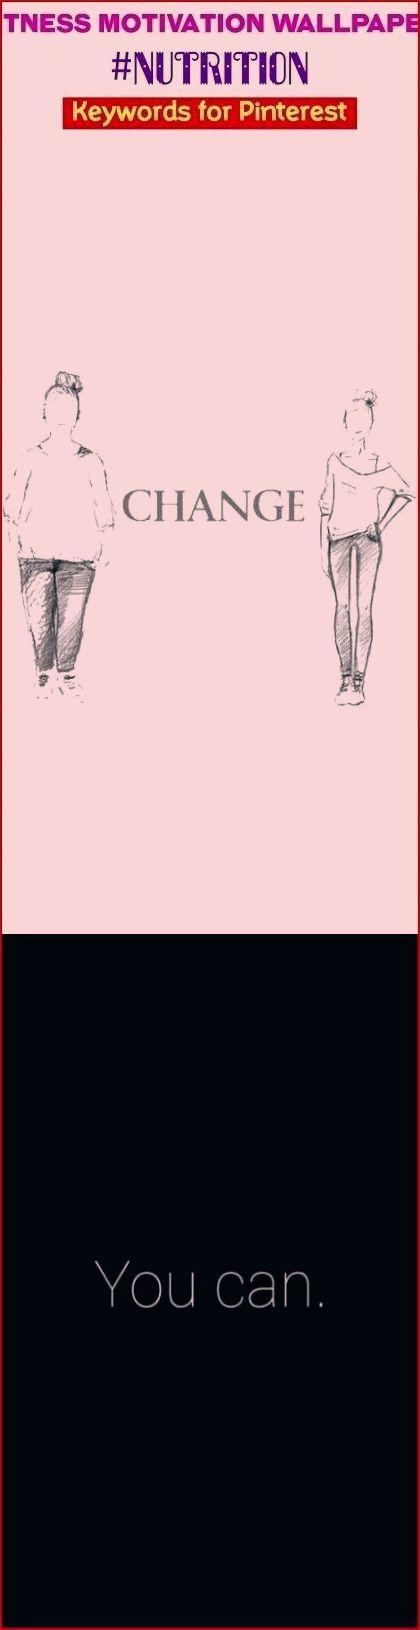 Fitness motivation wallpaper #nutrition #keywords #niches #seo #education. fitne... -  Fitness motiv...